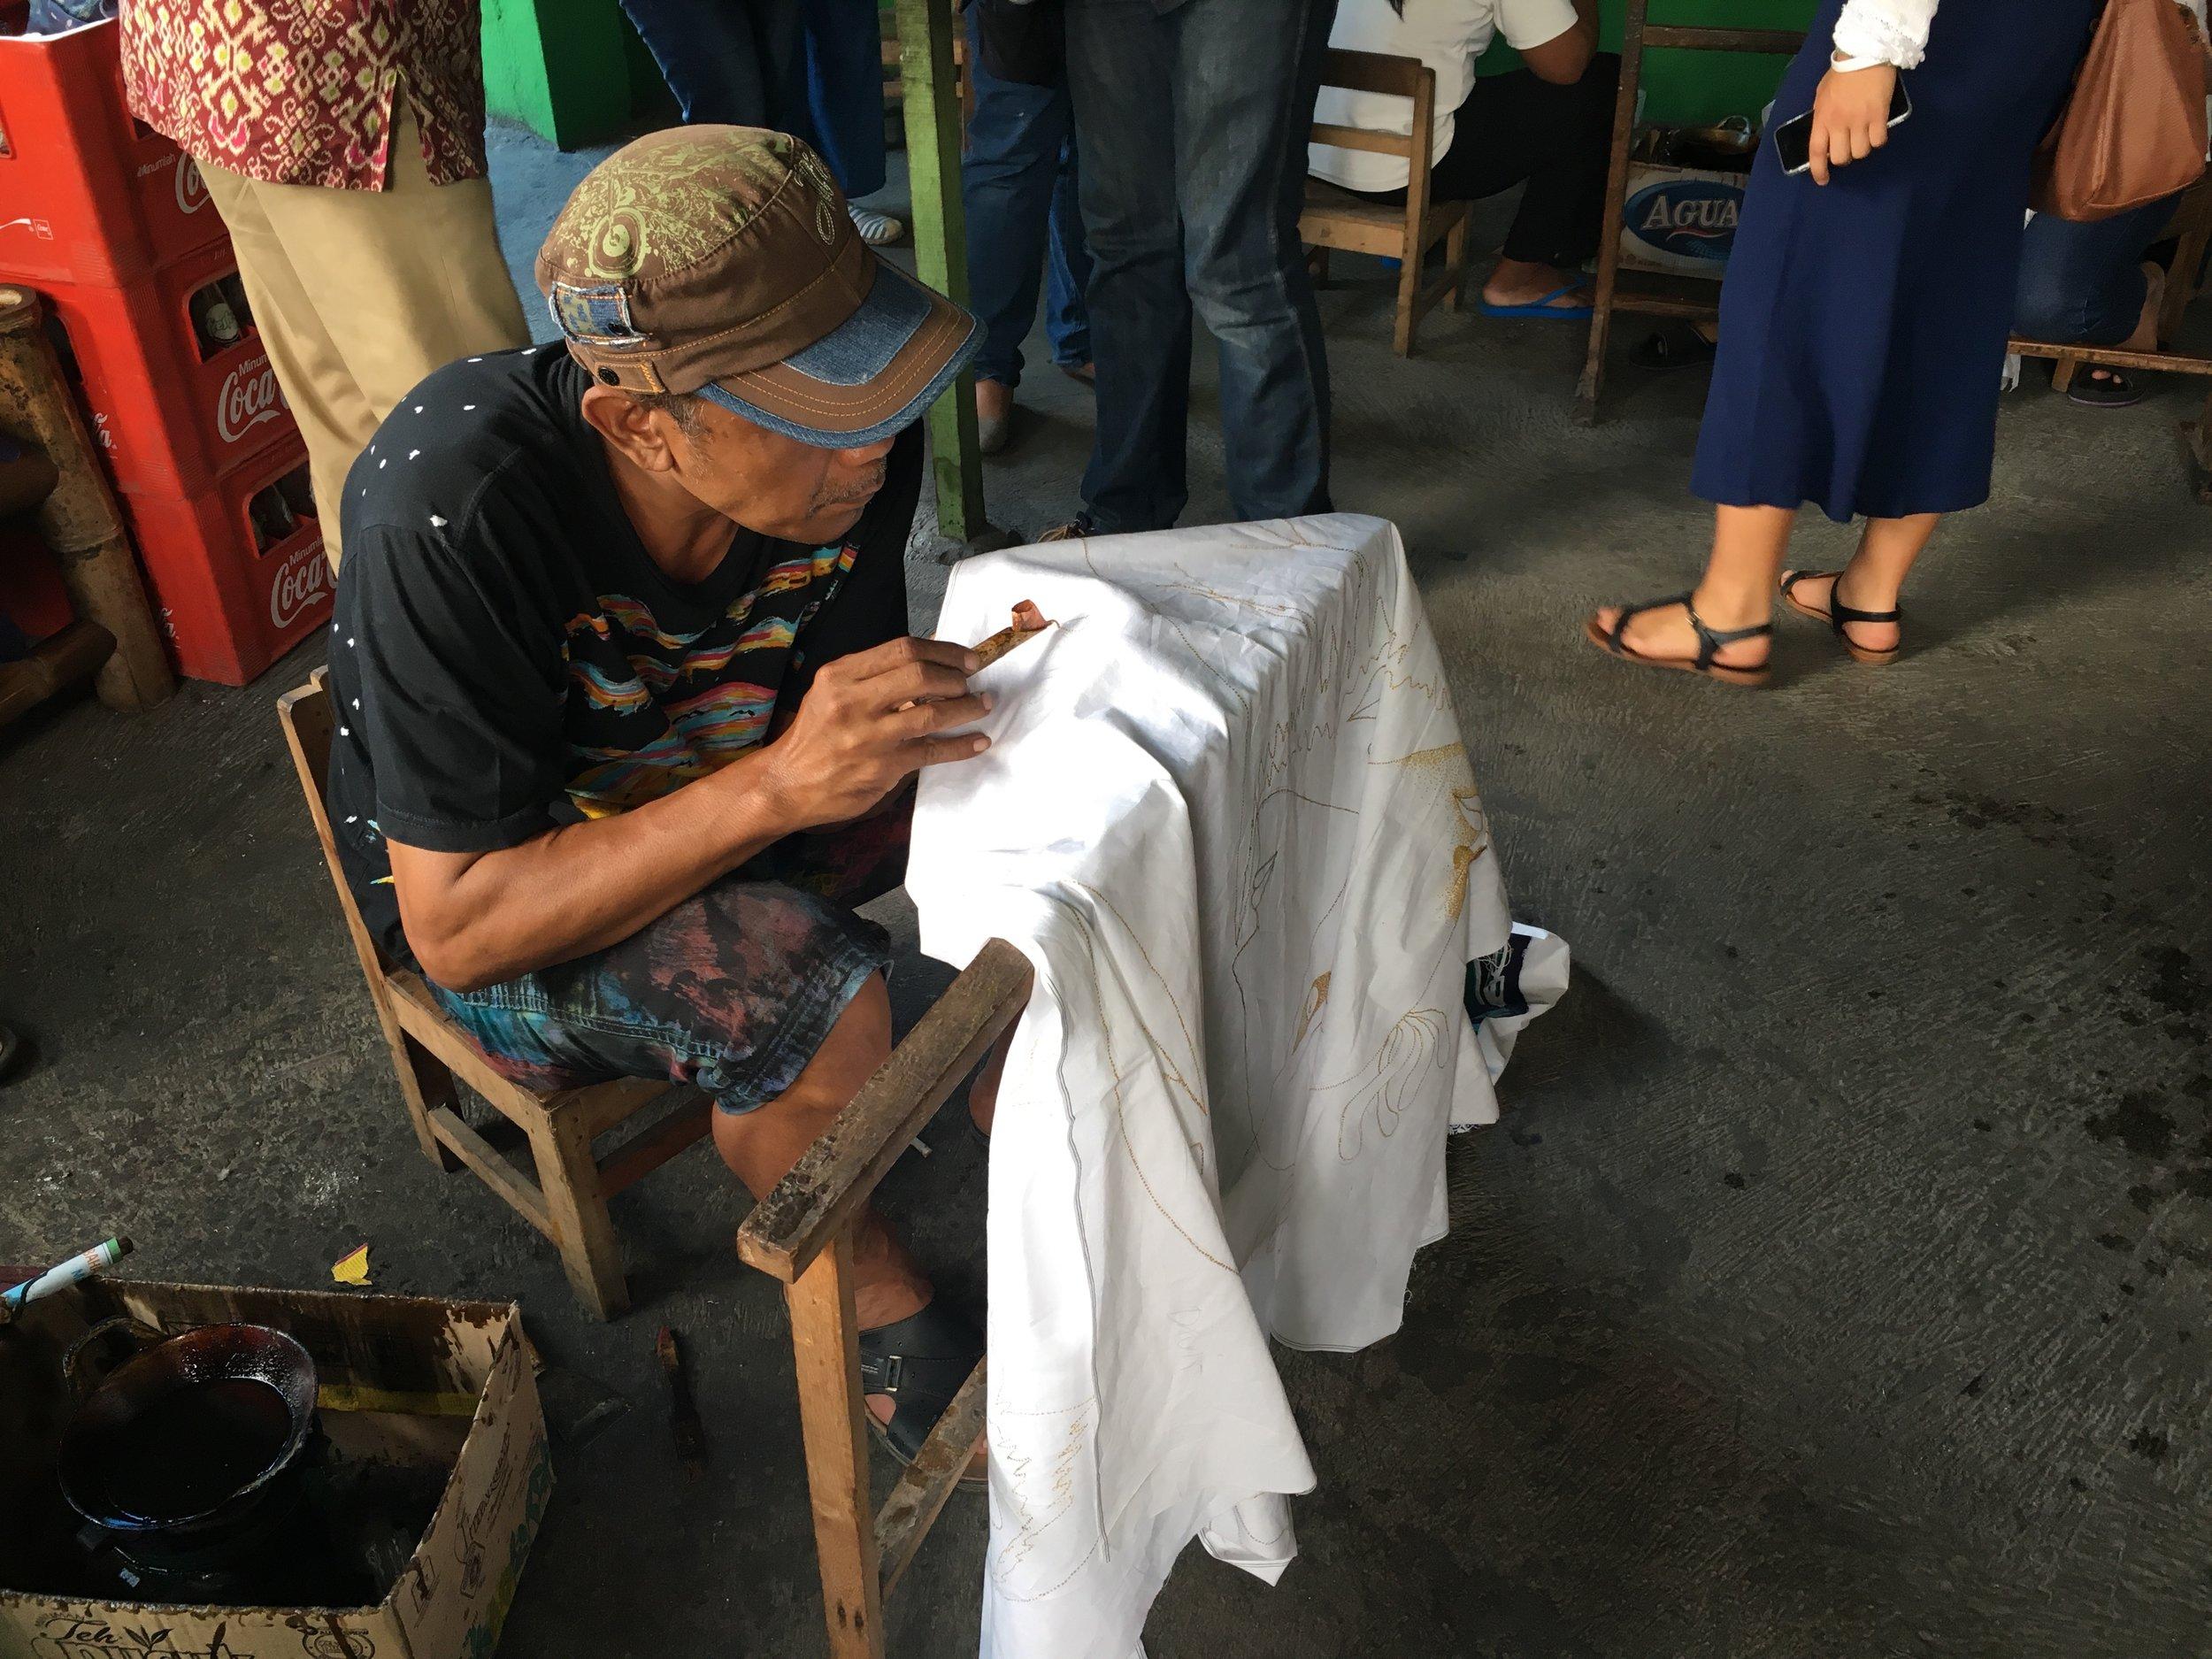 Making batik designed in hot wax.